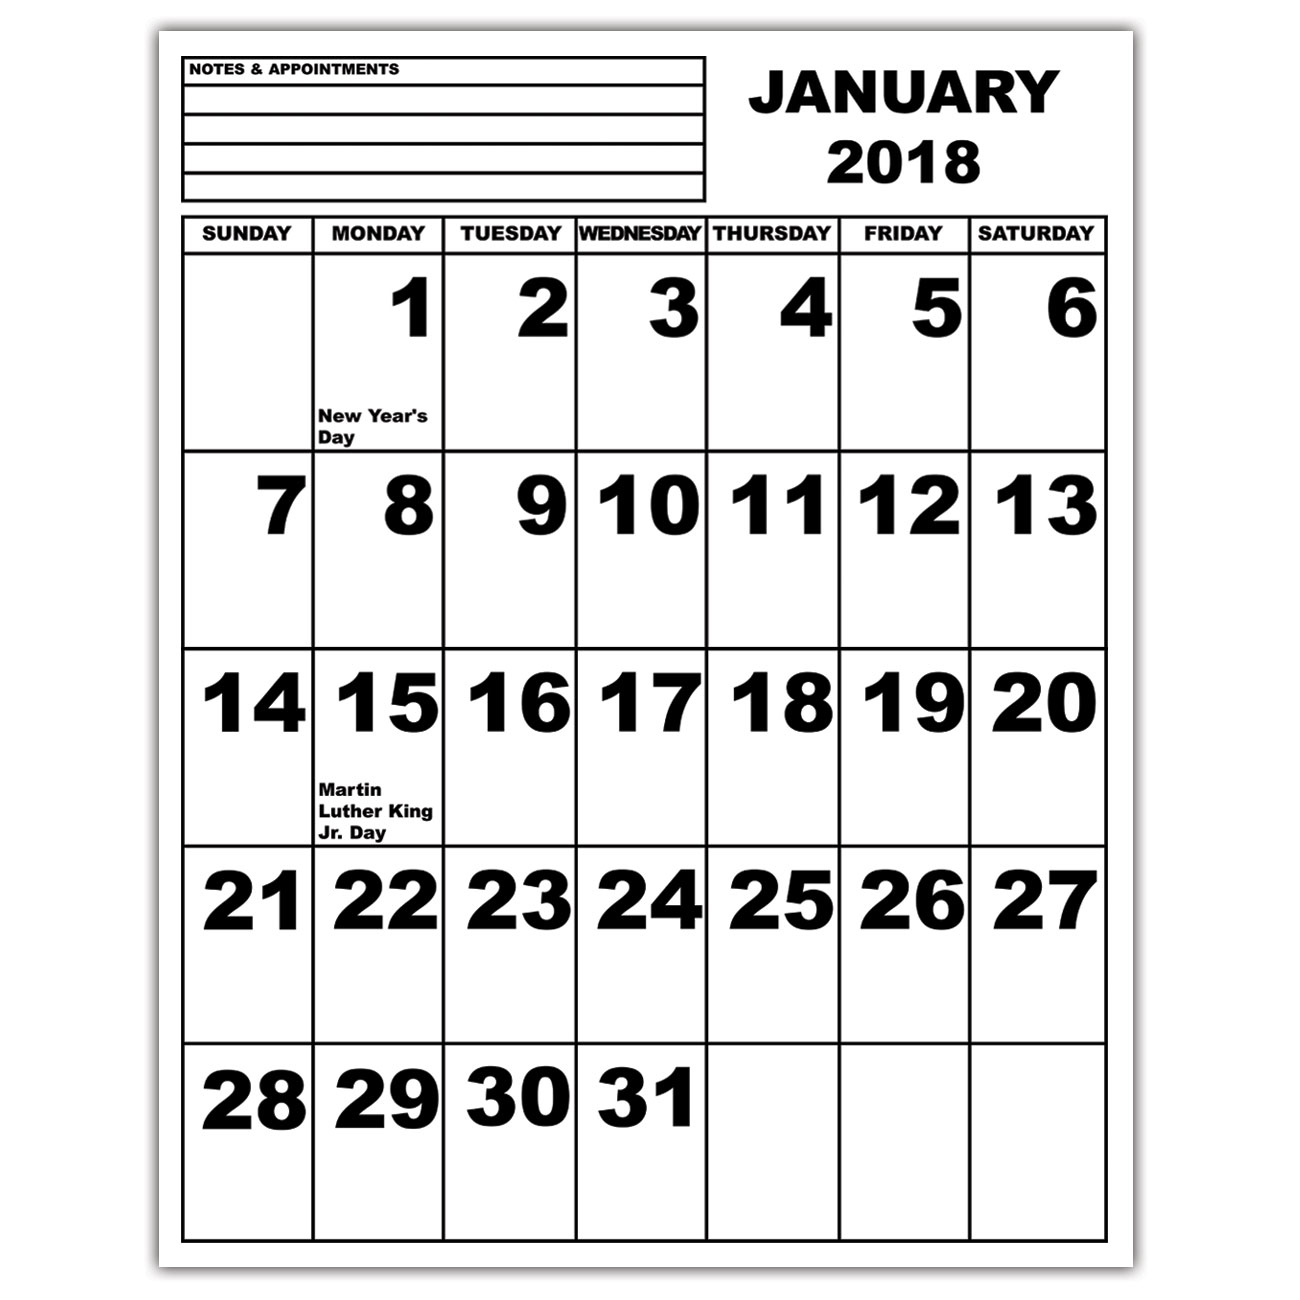 Jumbo Print Calendar - 2018